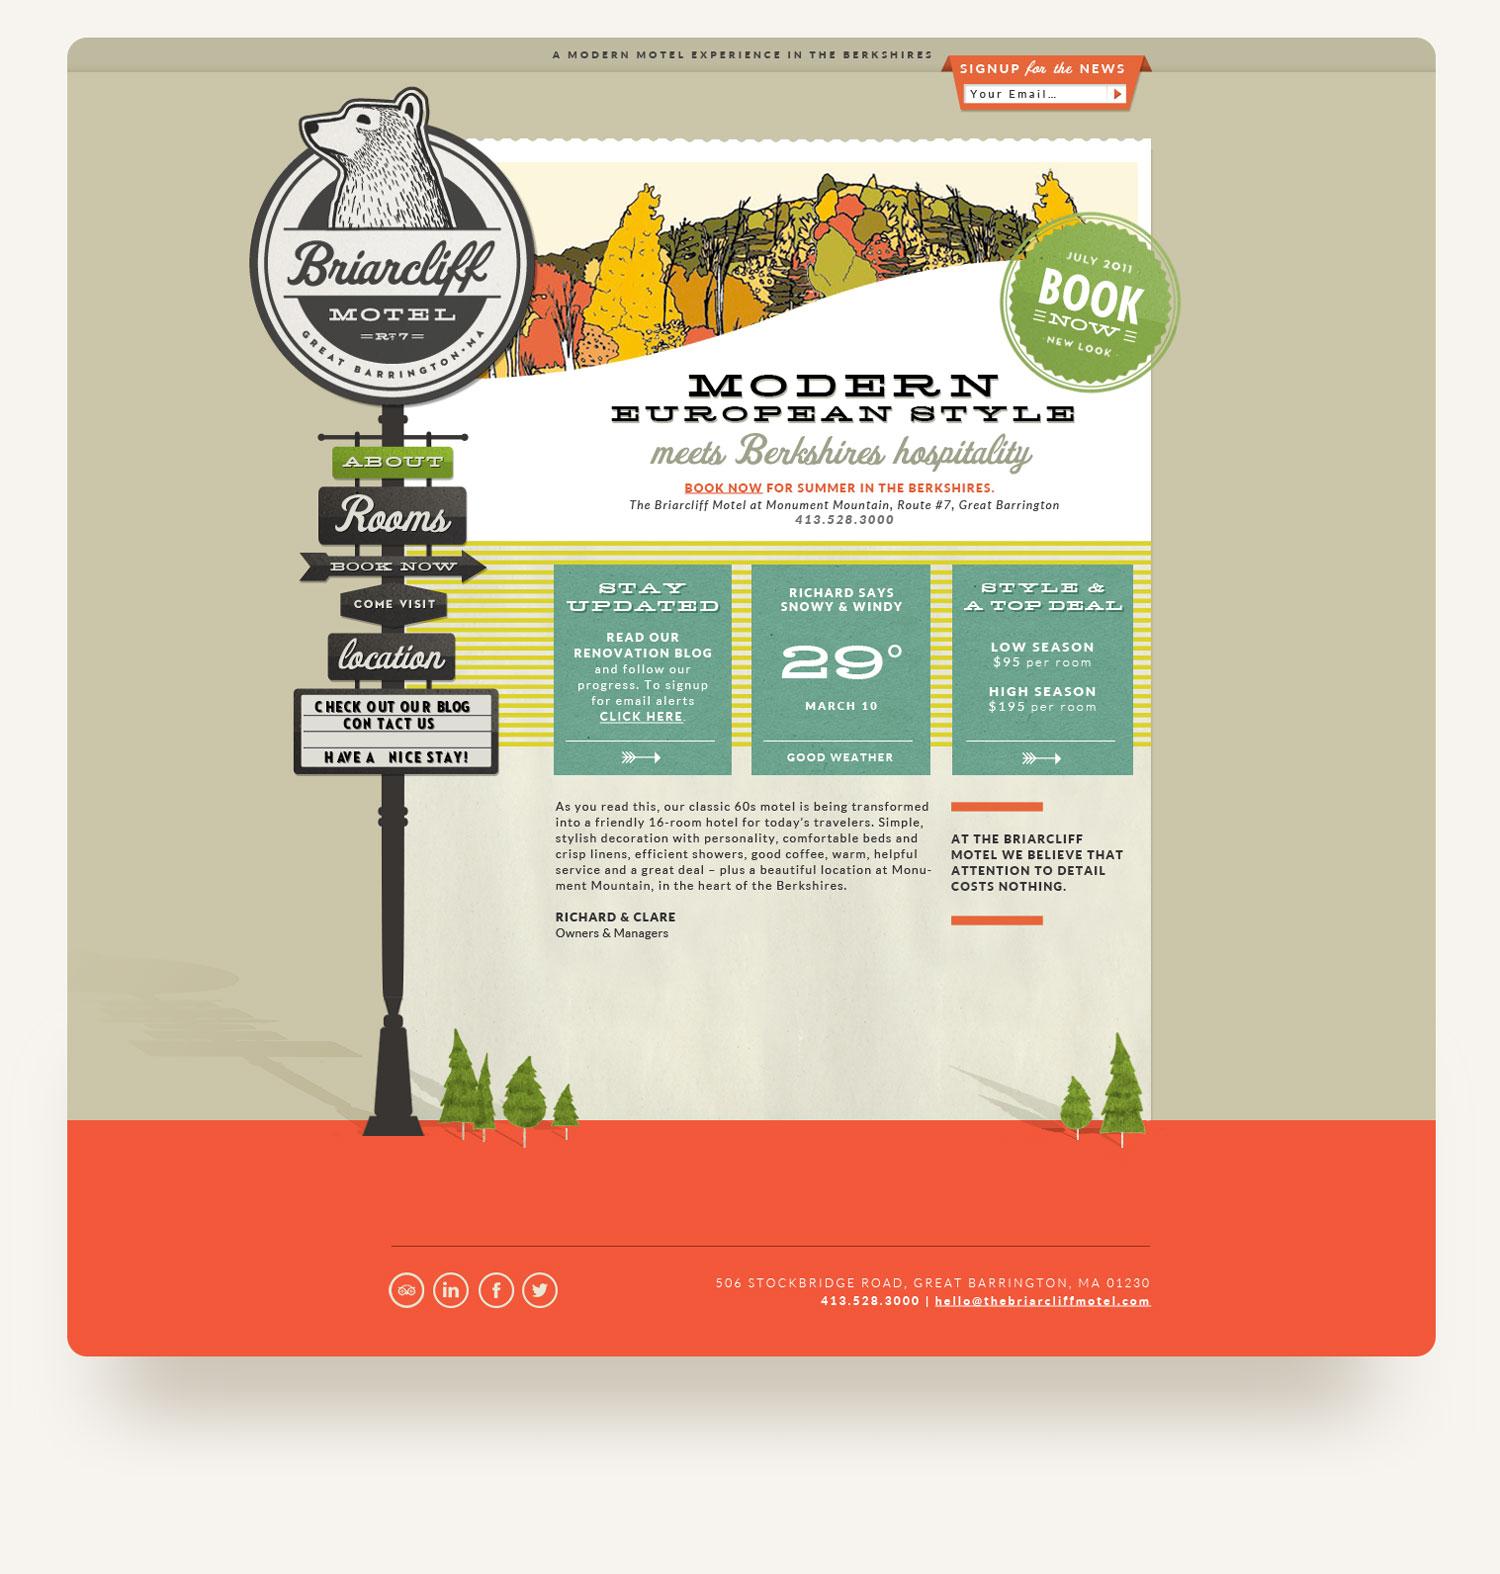 The Briarcliff Motel Berkshires website design. Bear logo, retro signage navigation. design by brittany hurdle beckon webeckon